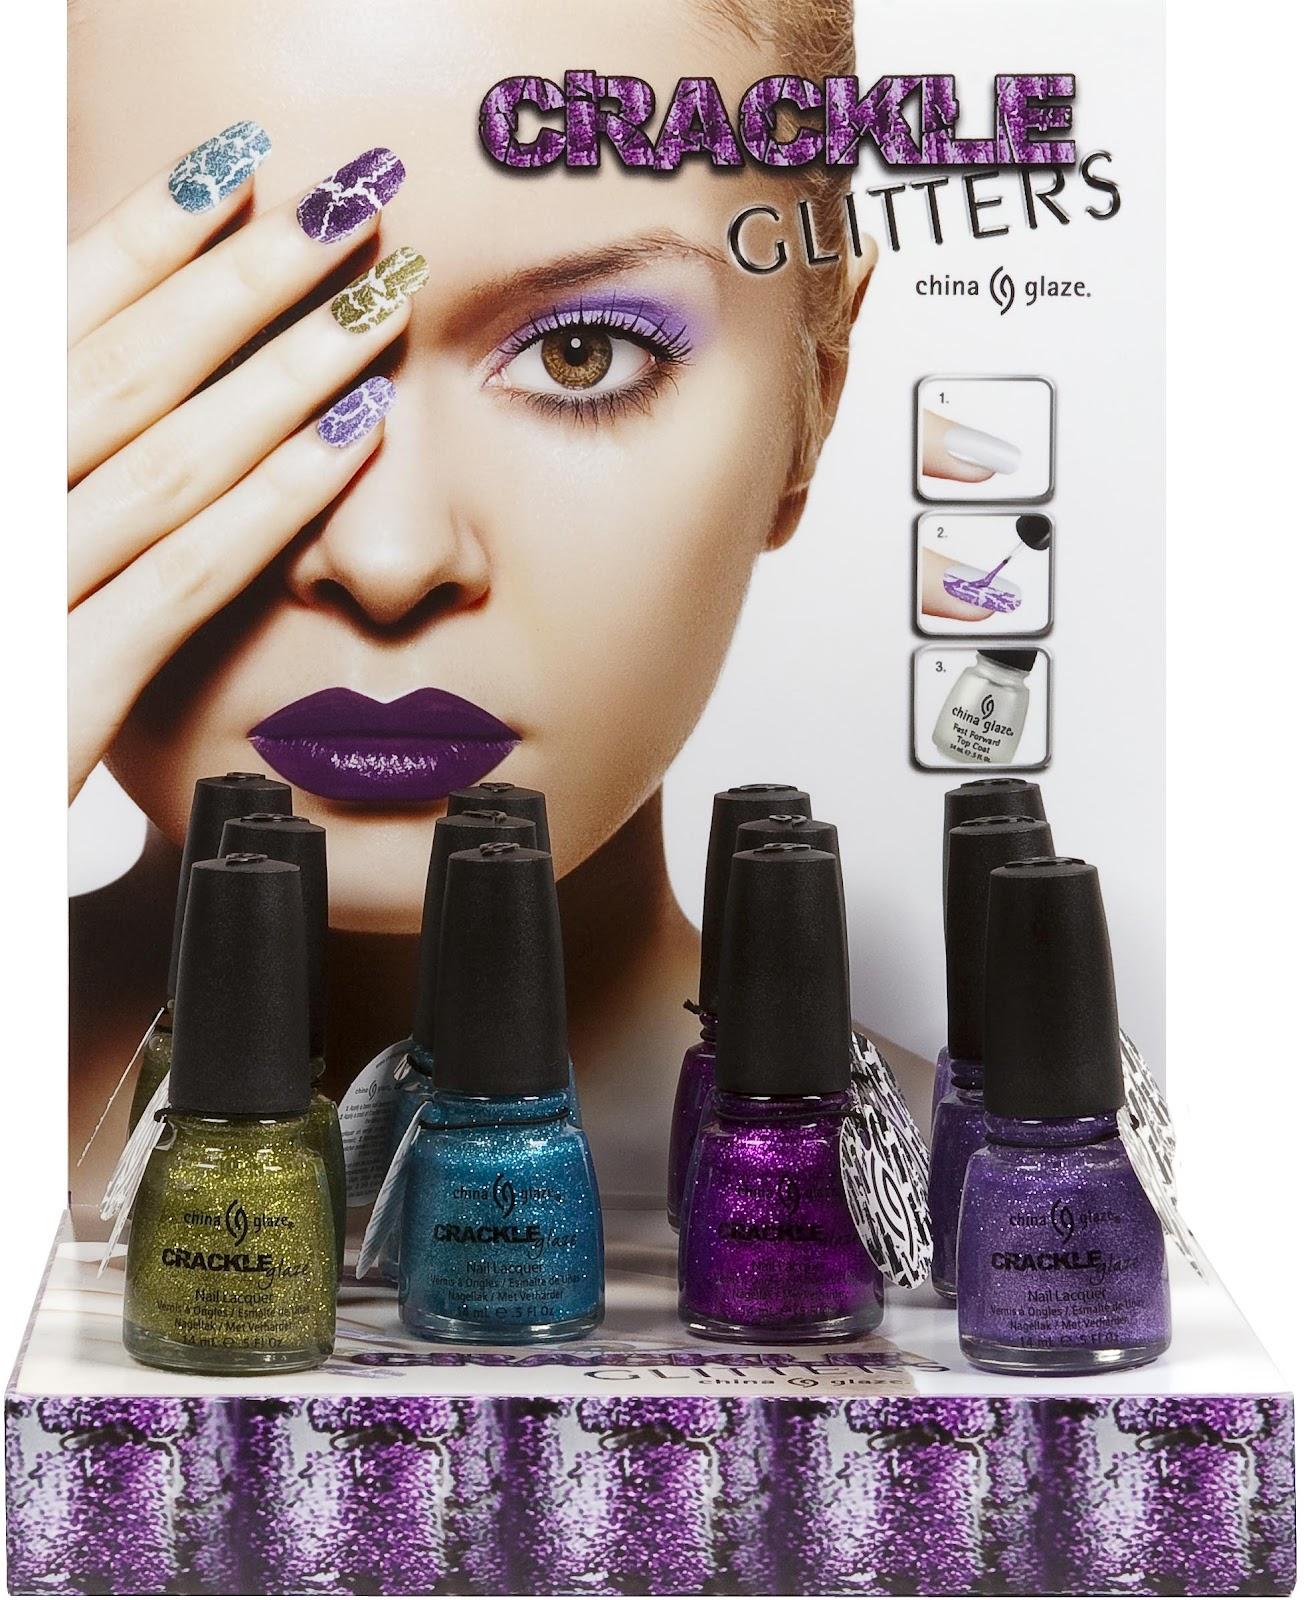 Hair amp nail choices aiibeauty - China Glaze Crackle Glitters